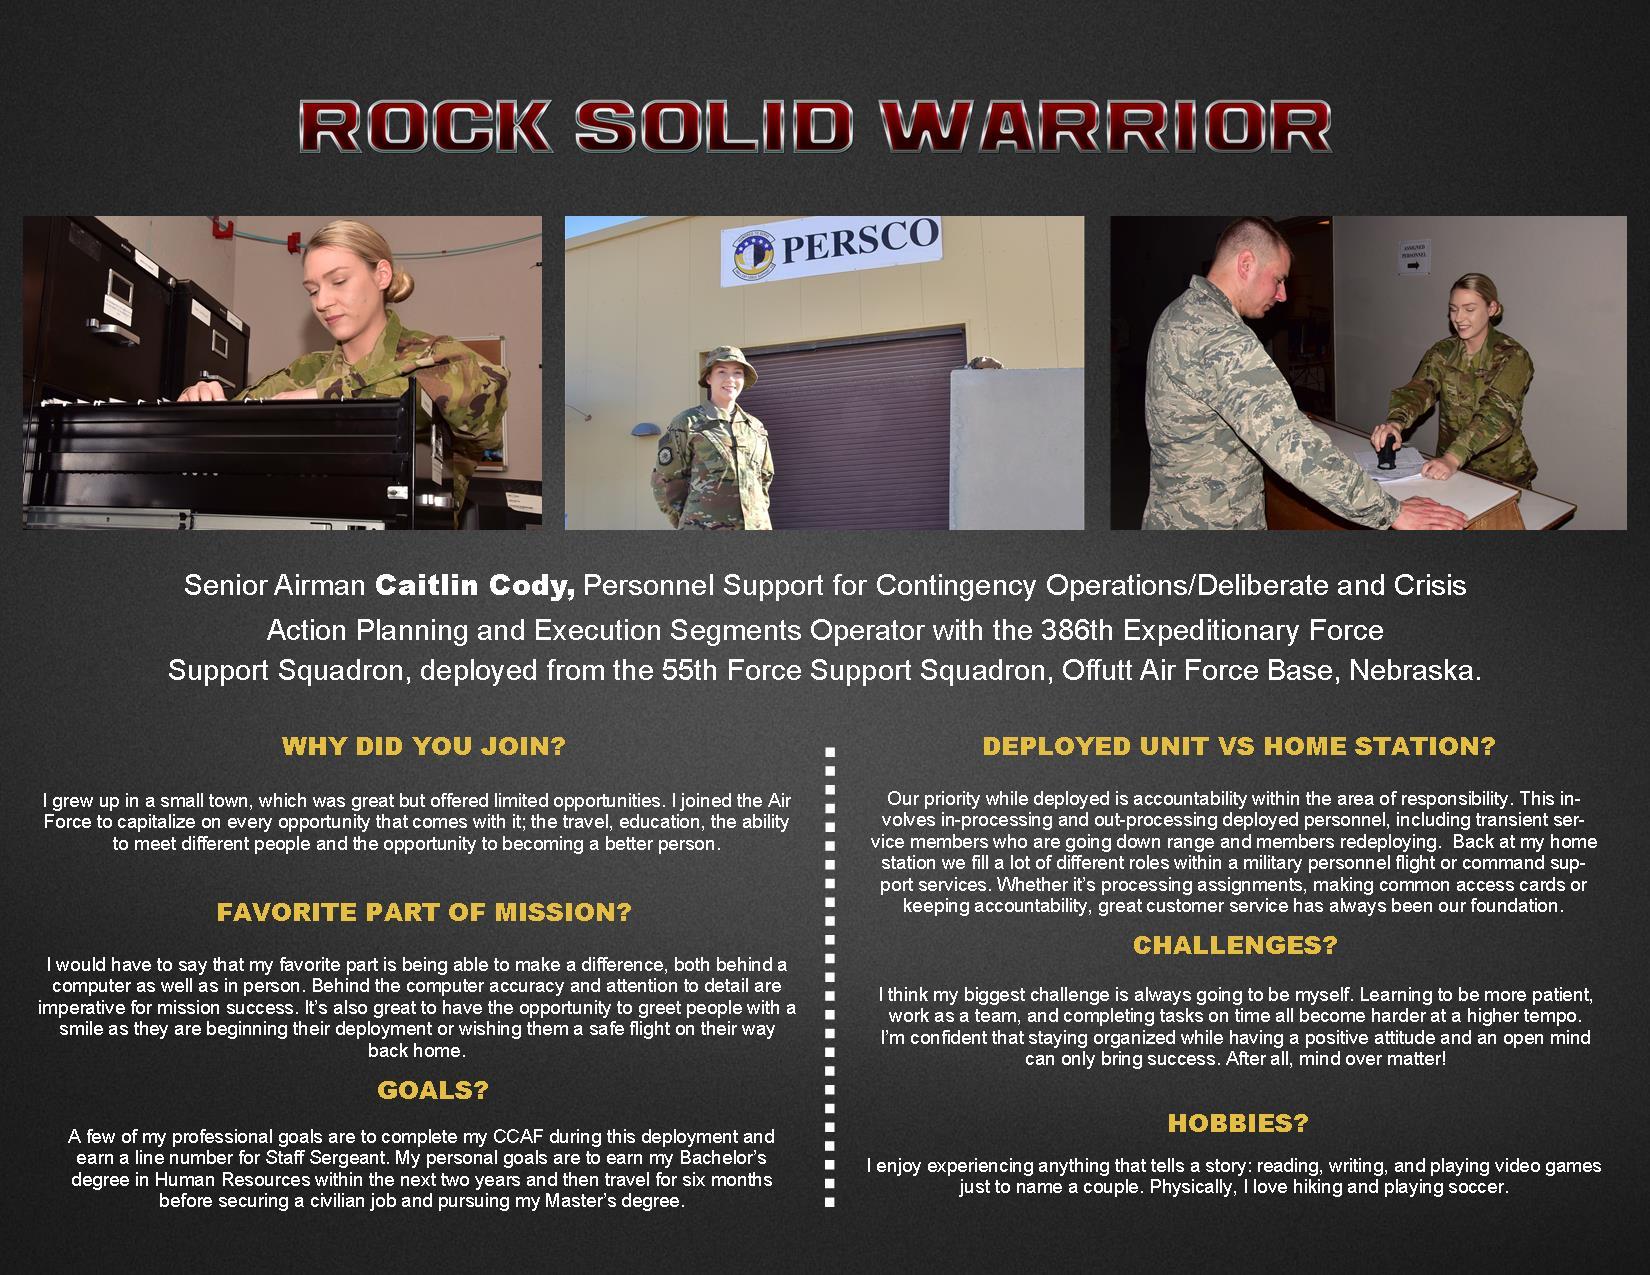 Rock Solid Warrior Senior Airman Caitlin Cody Us Air Forces